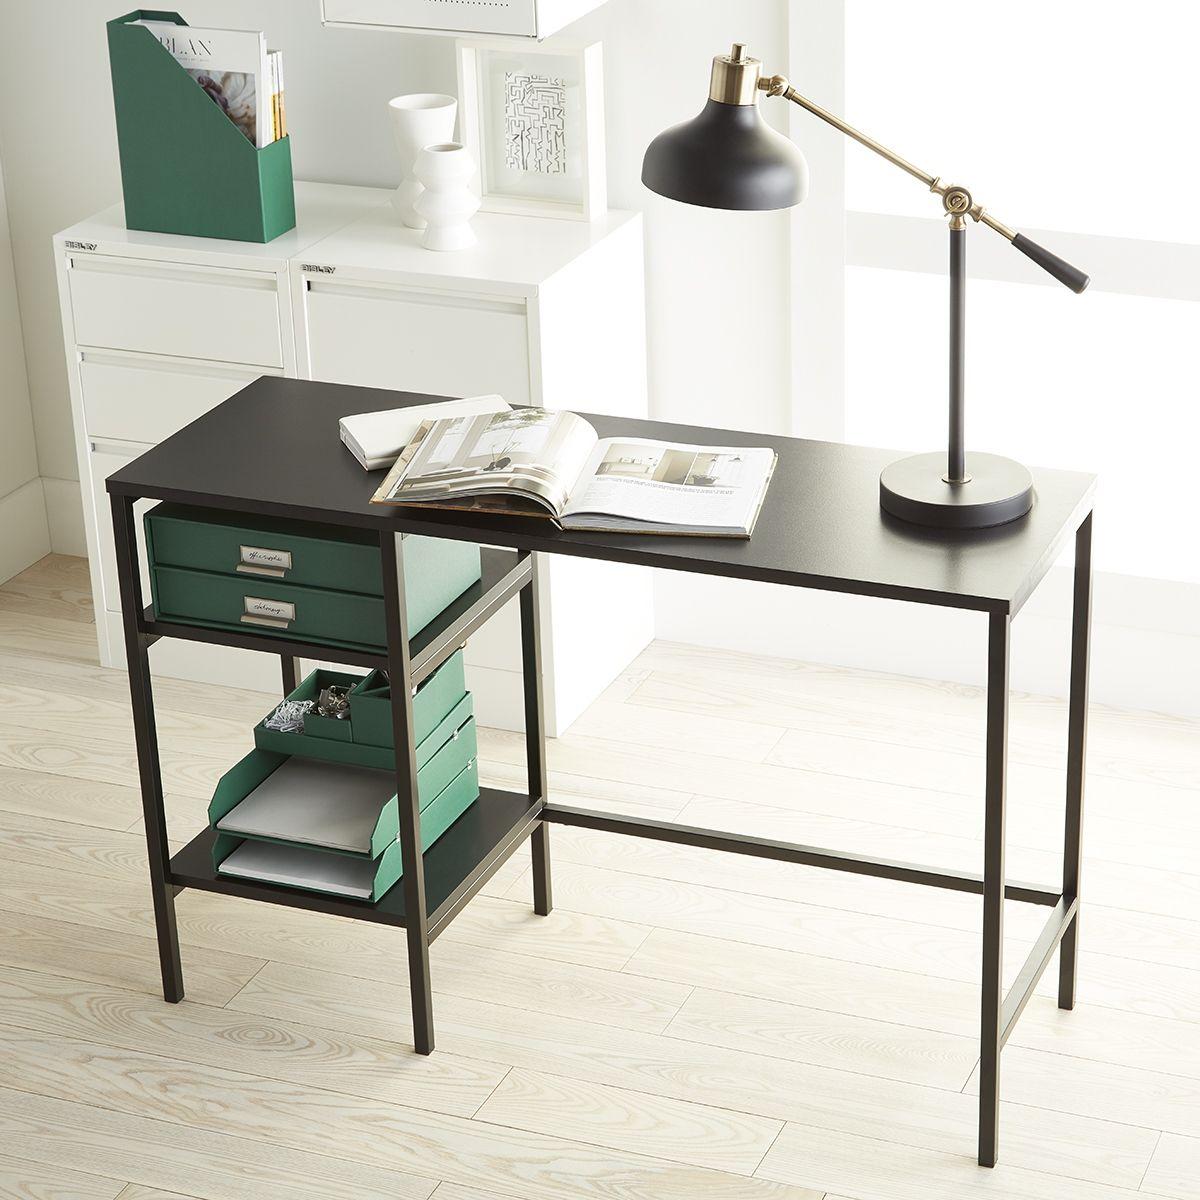 Niche Converted To A Mini Working Desk Diy Shelves Under 60